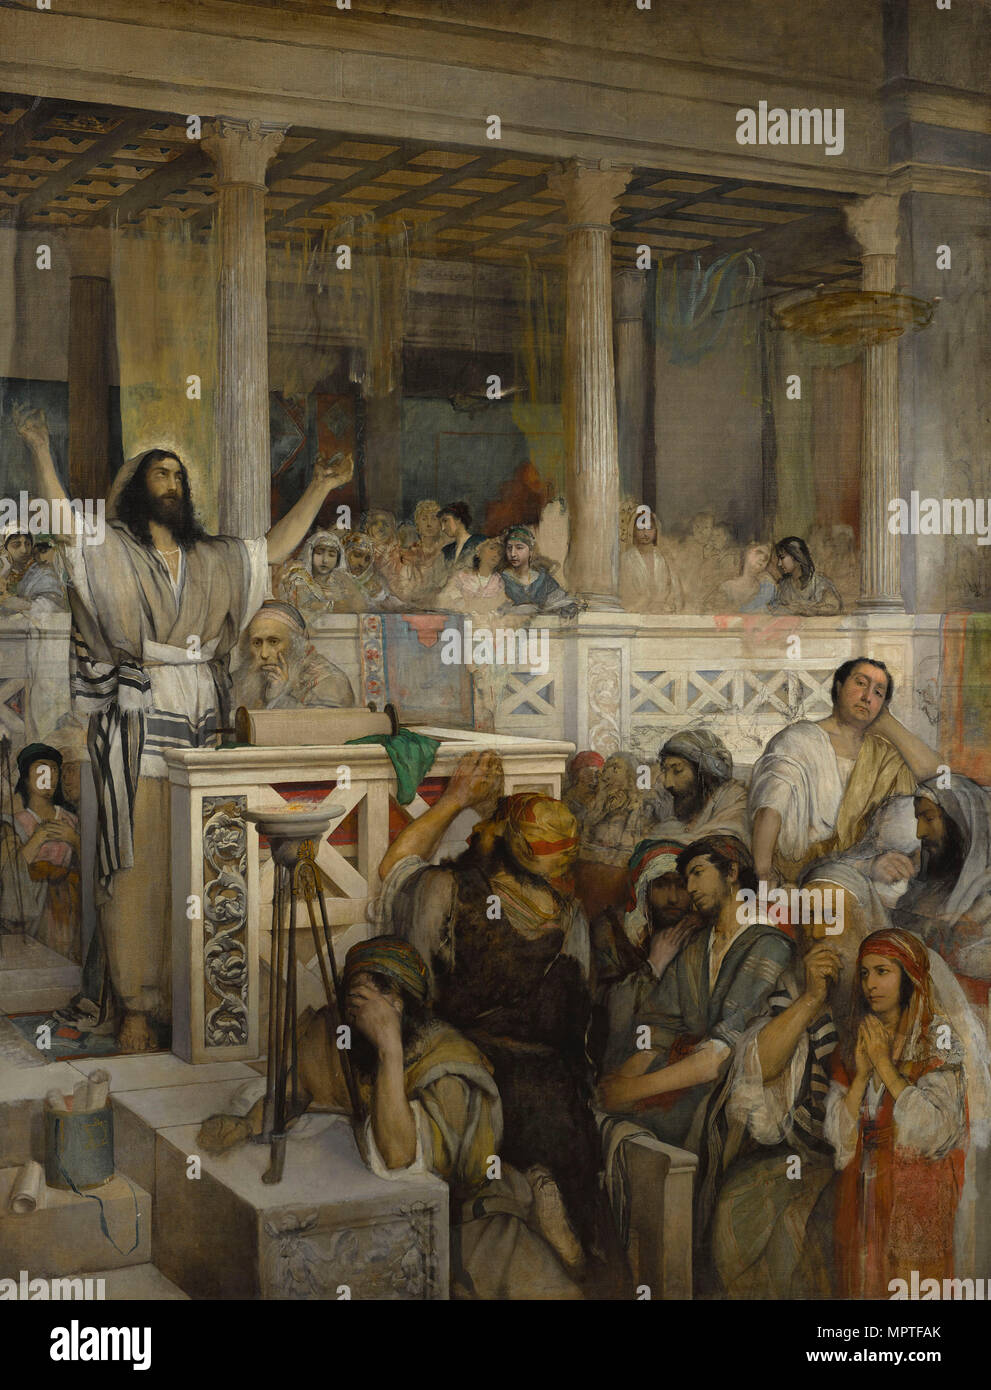 Christ Preaching at Capernaum, 1878-1879. - Stock Image